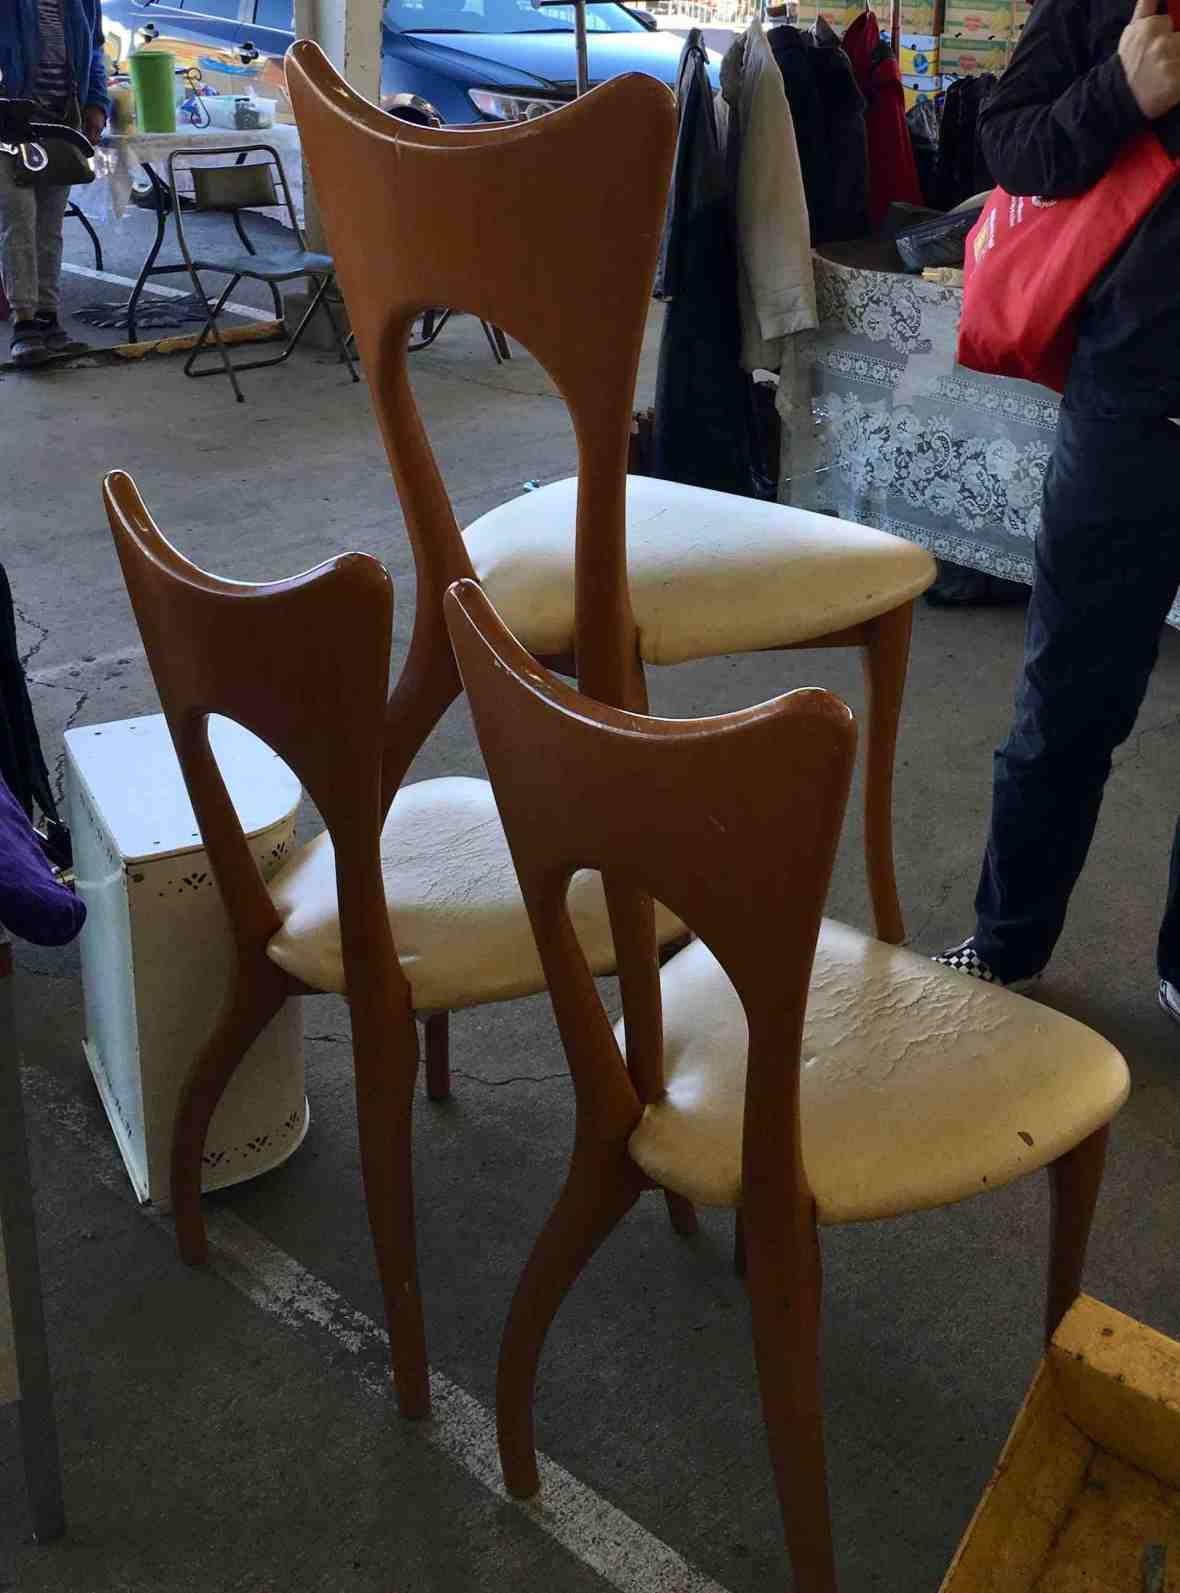 Unusual mid century chairs (designer unknown) at Nashville Flea Market